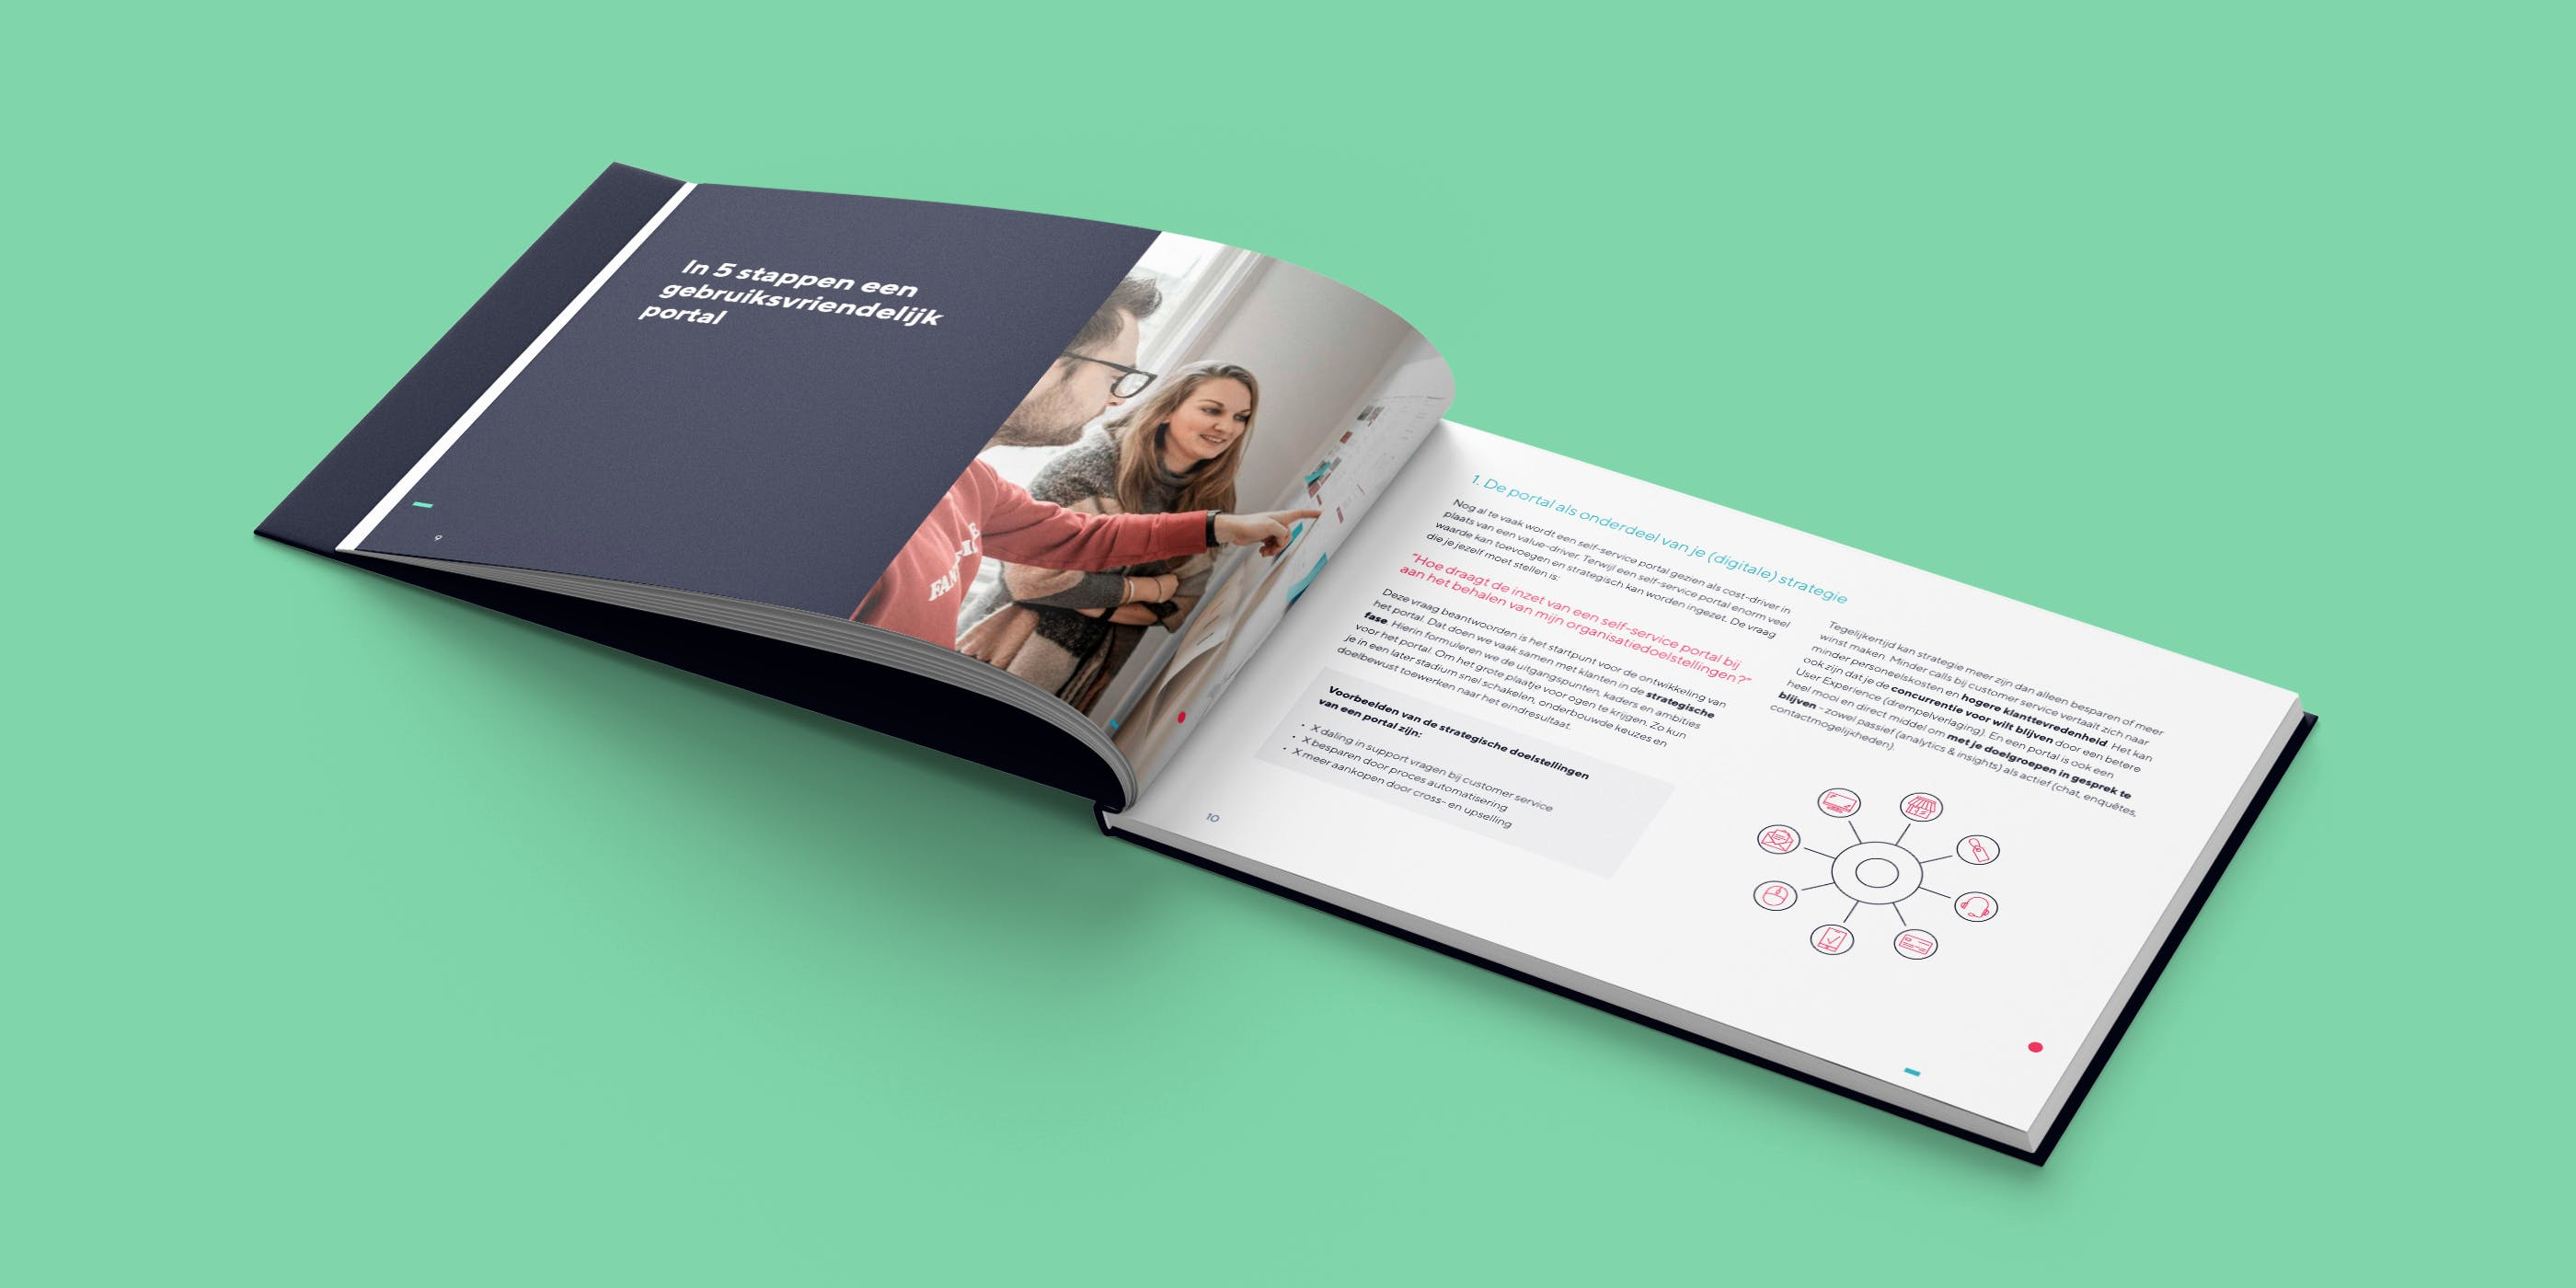 self-service portal whitepaper